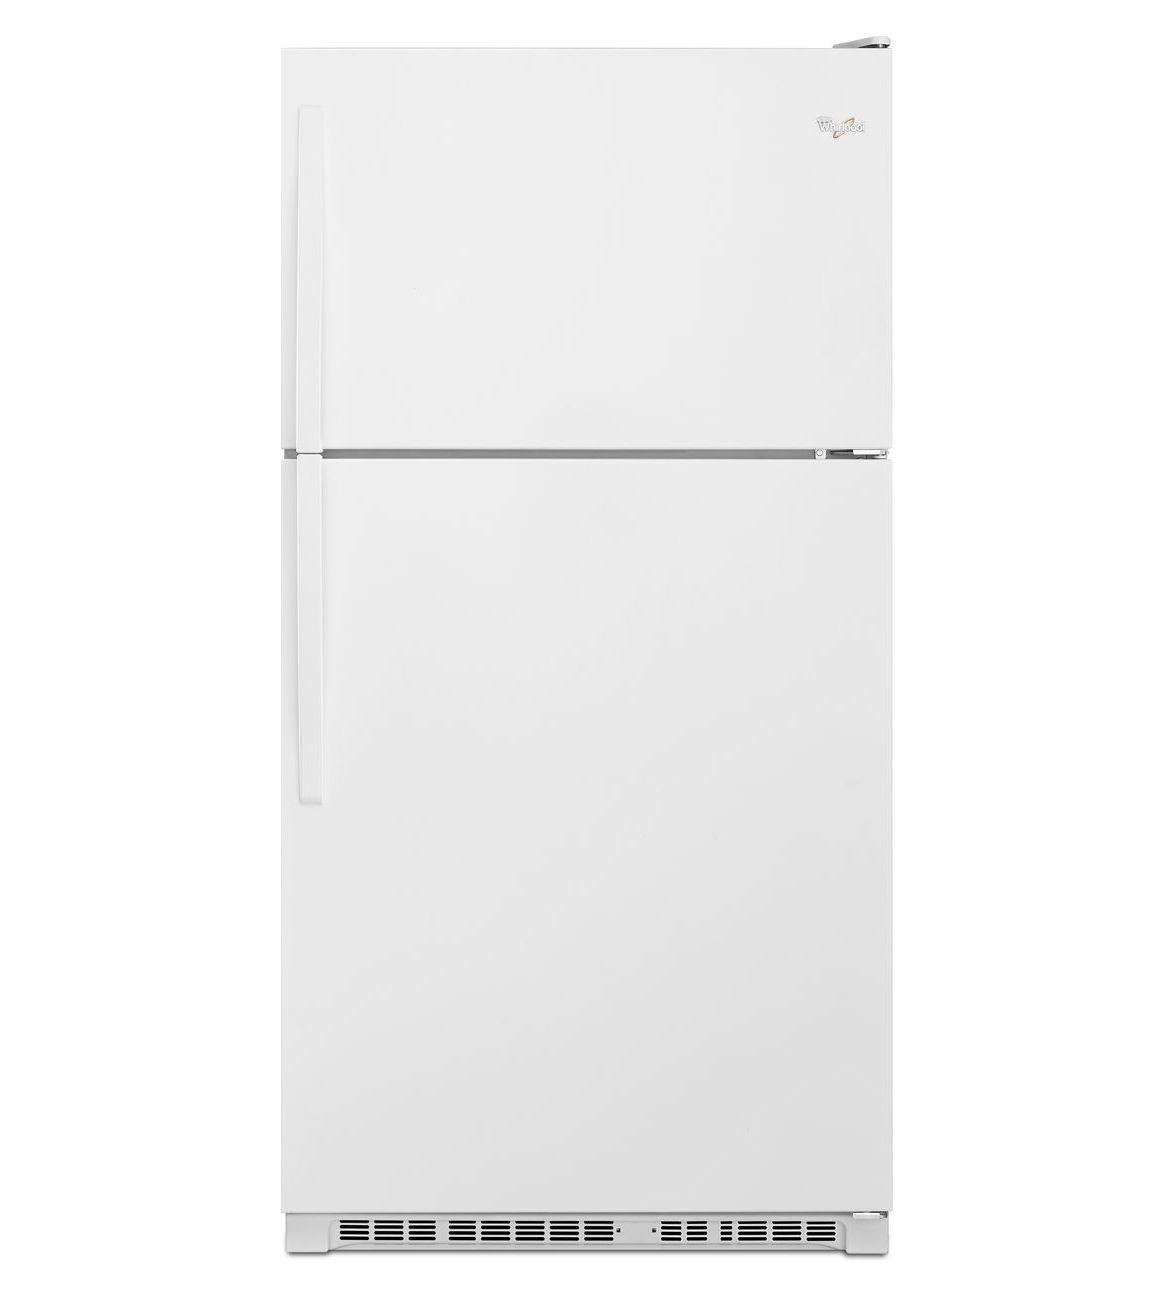 Whirlpool 20 Cubic Foot White Refrigerator Wrt311fzdw